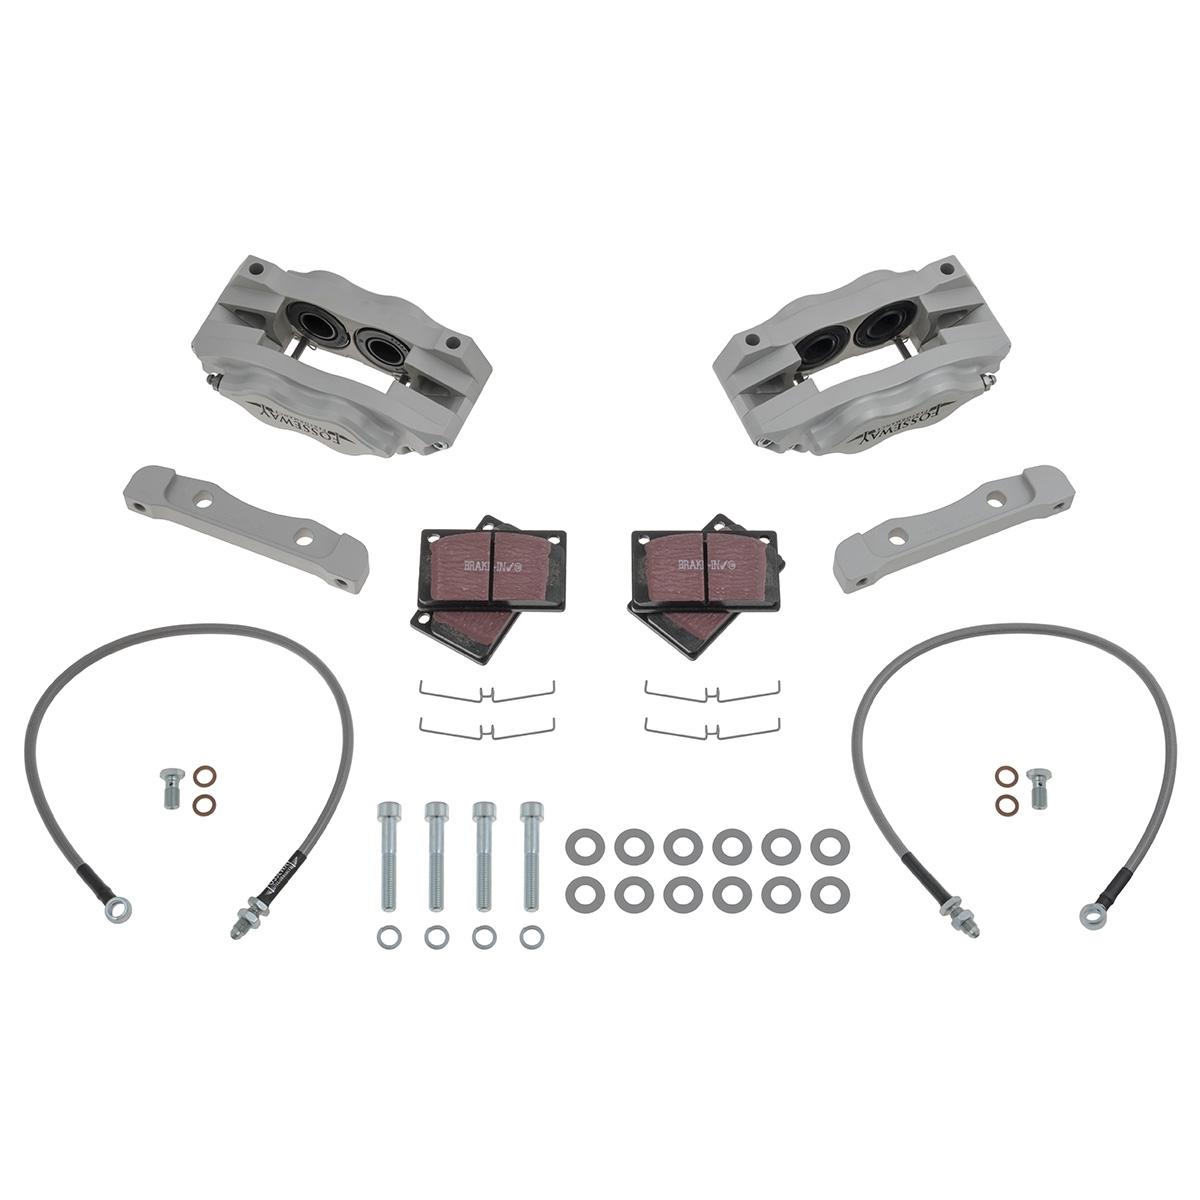 JAGUAR DAIMLER FRONT BRAKE DISCS /& PADS FIT XJ6 SERIES 1